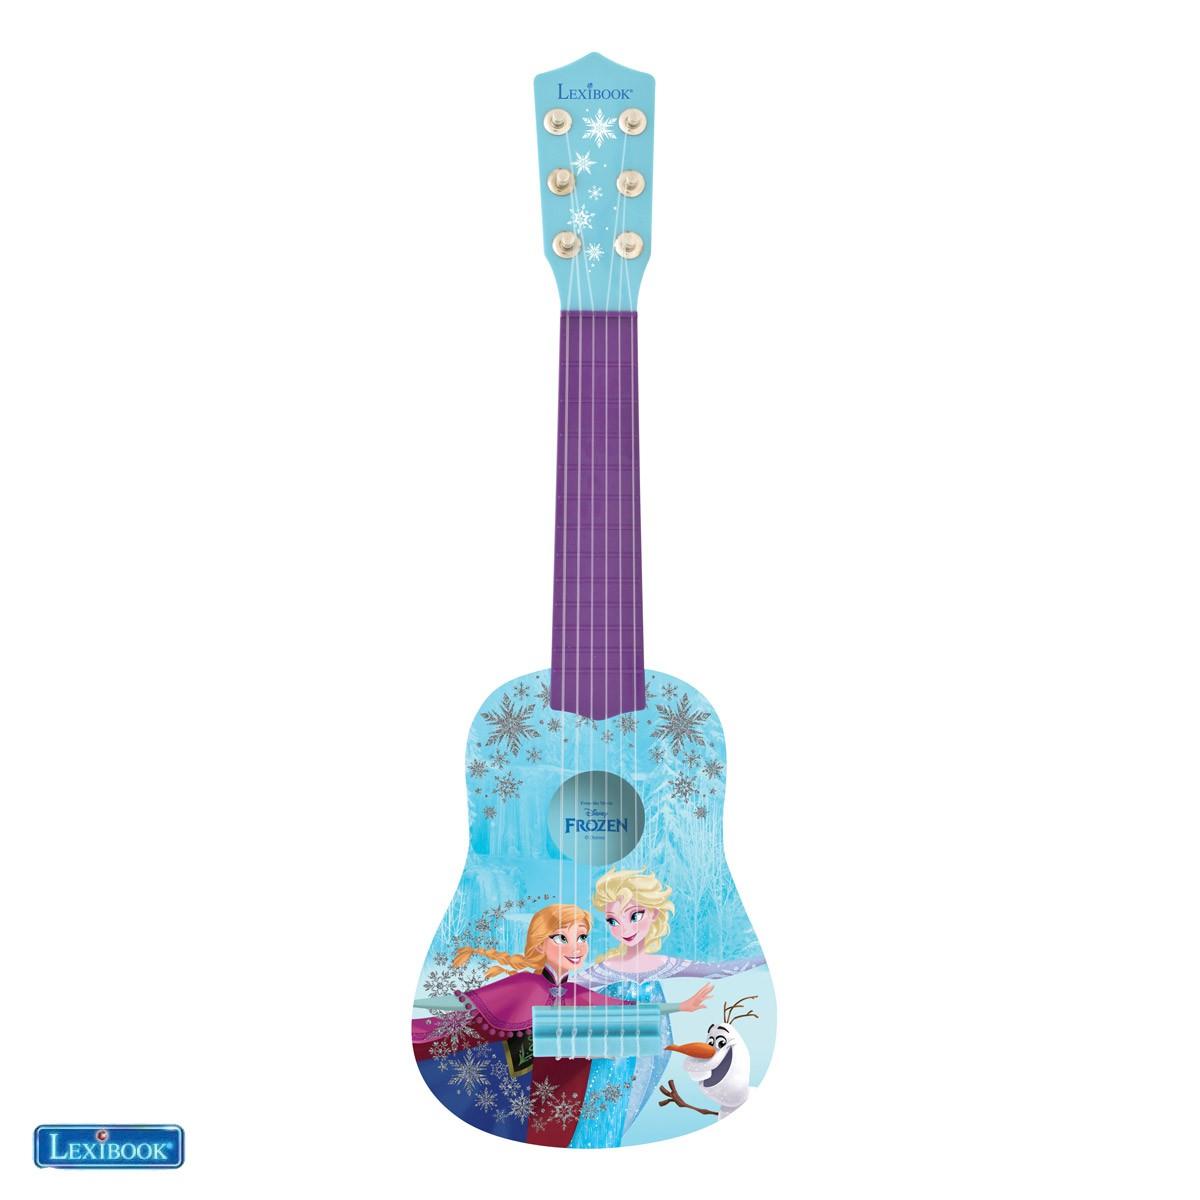 Ma Première Guitare Reine des Neiges - Lexibook K200FZ_01